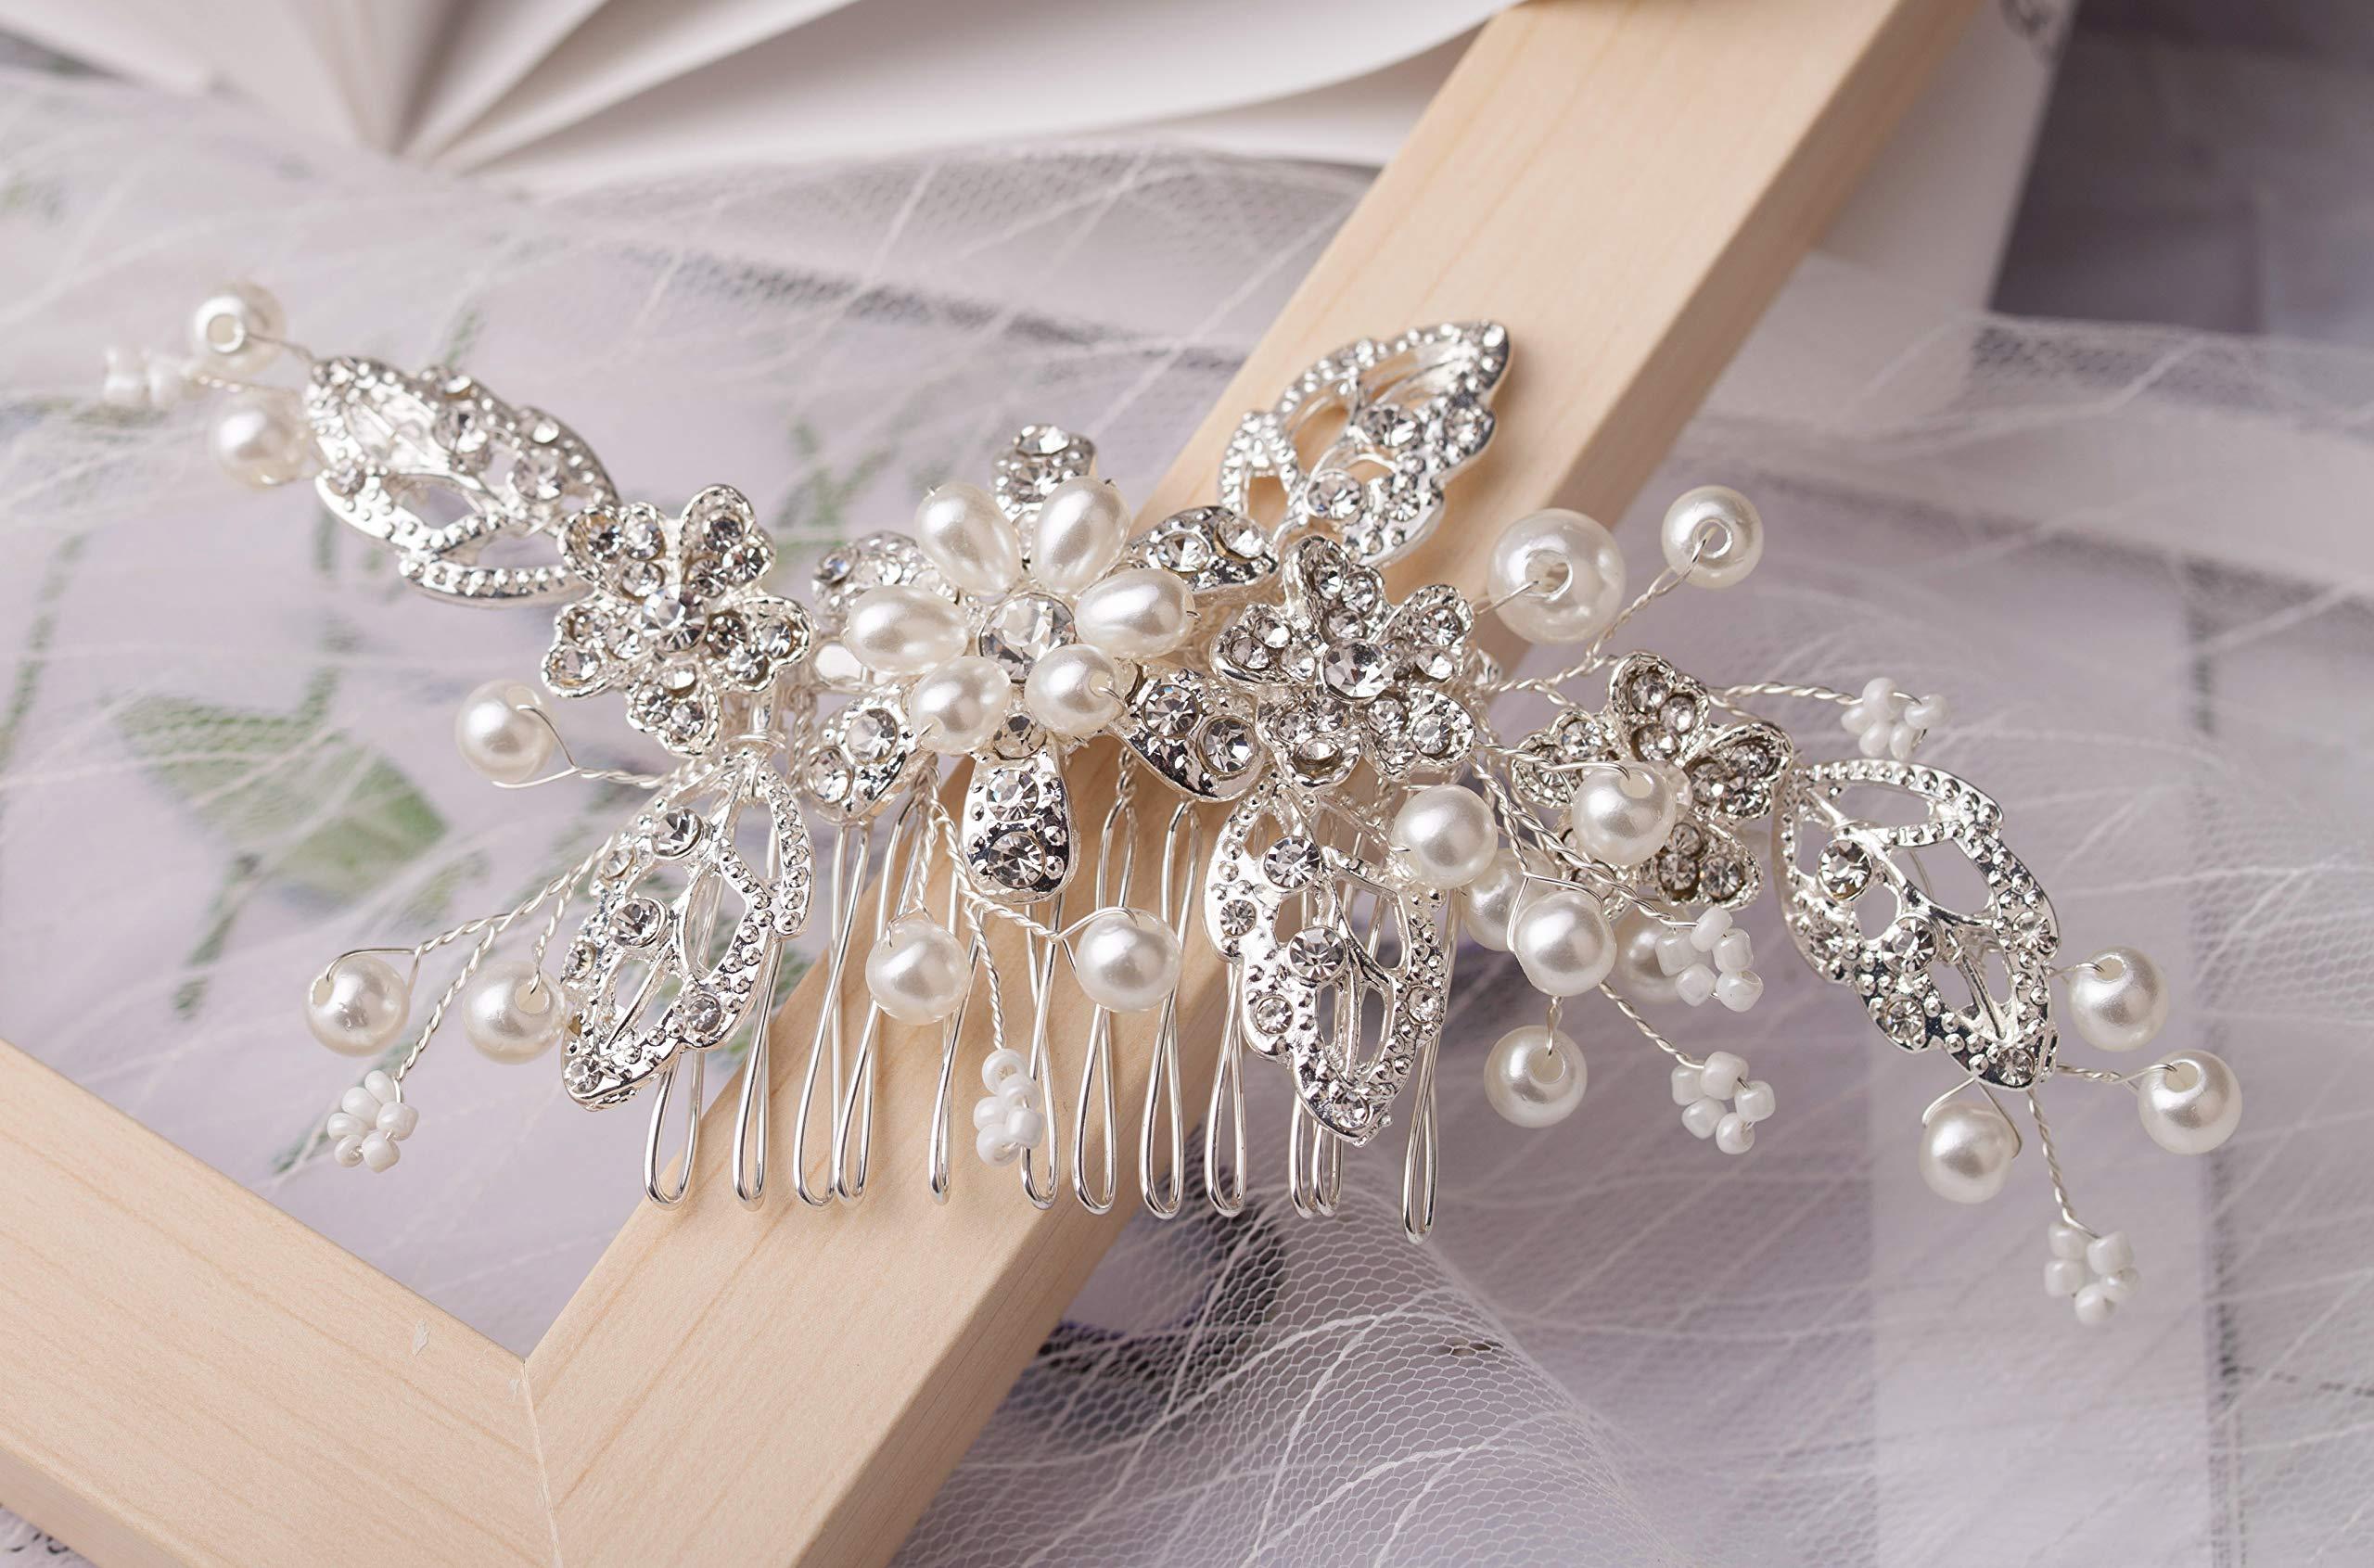 SNOWH Wedding Hair Accessories for Women Pearl Bridal Hair Comb Rhinestone Hair Clips Handmade Headpieces for Brides Bridesmaid, Silver by SNOWH